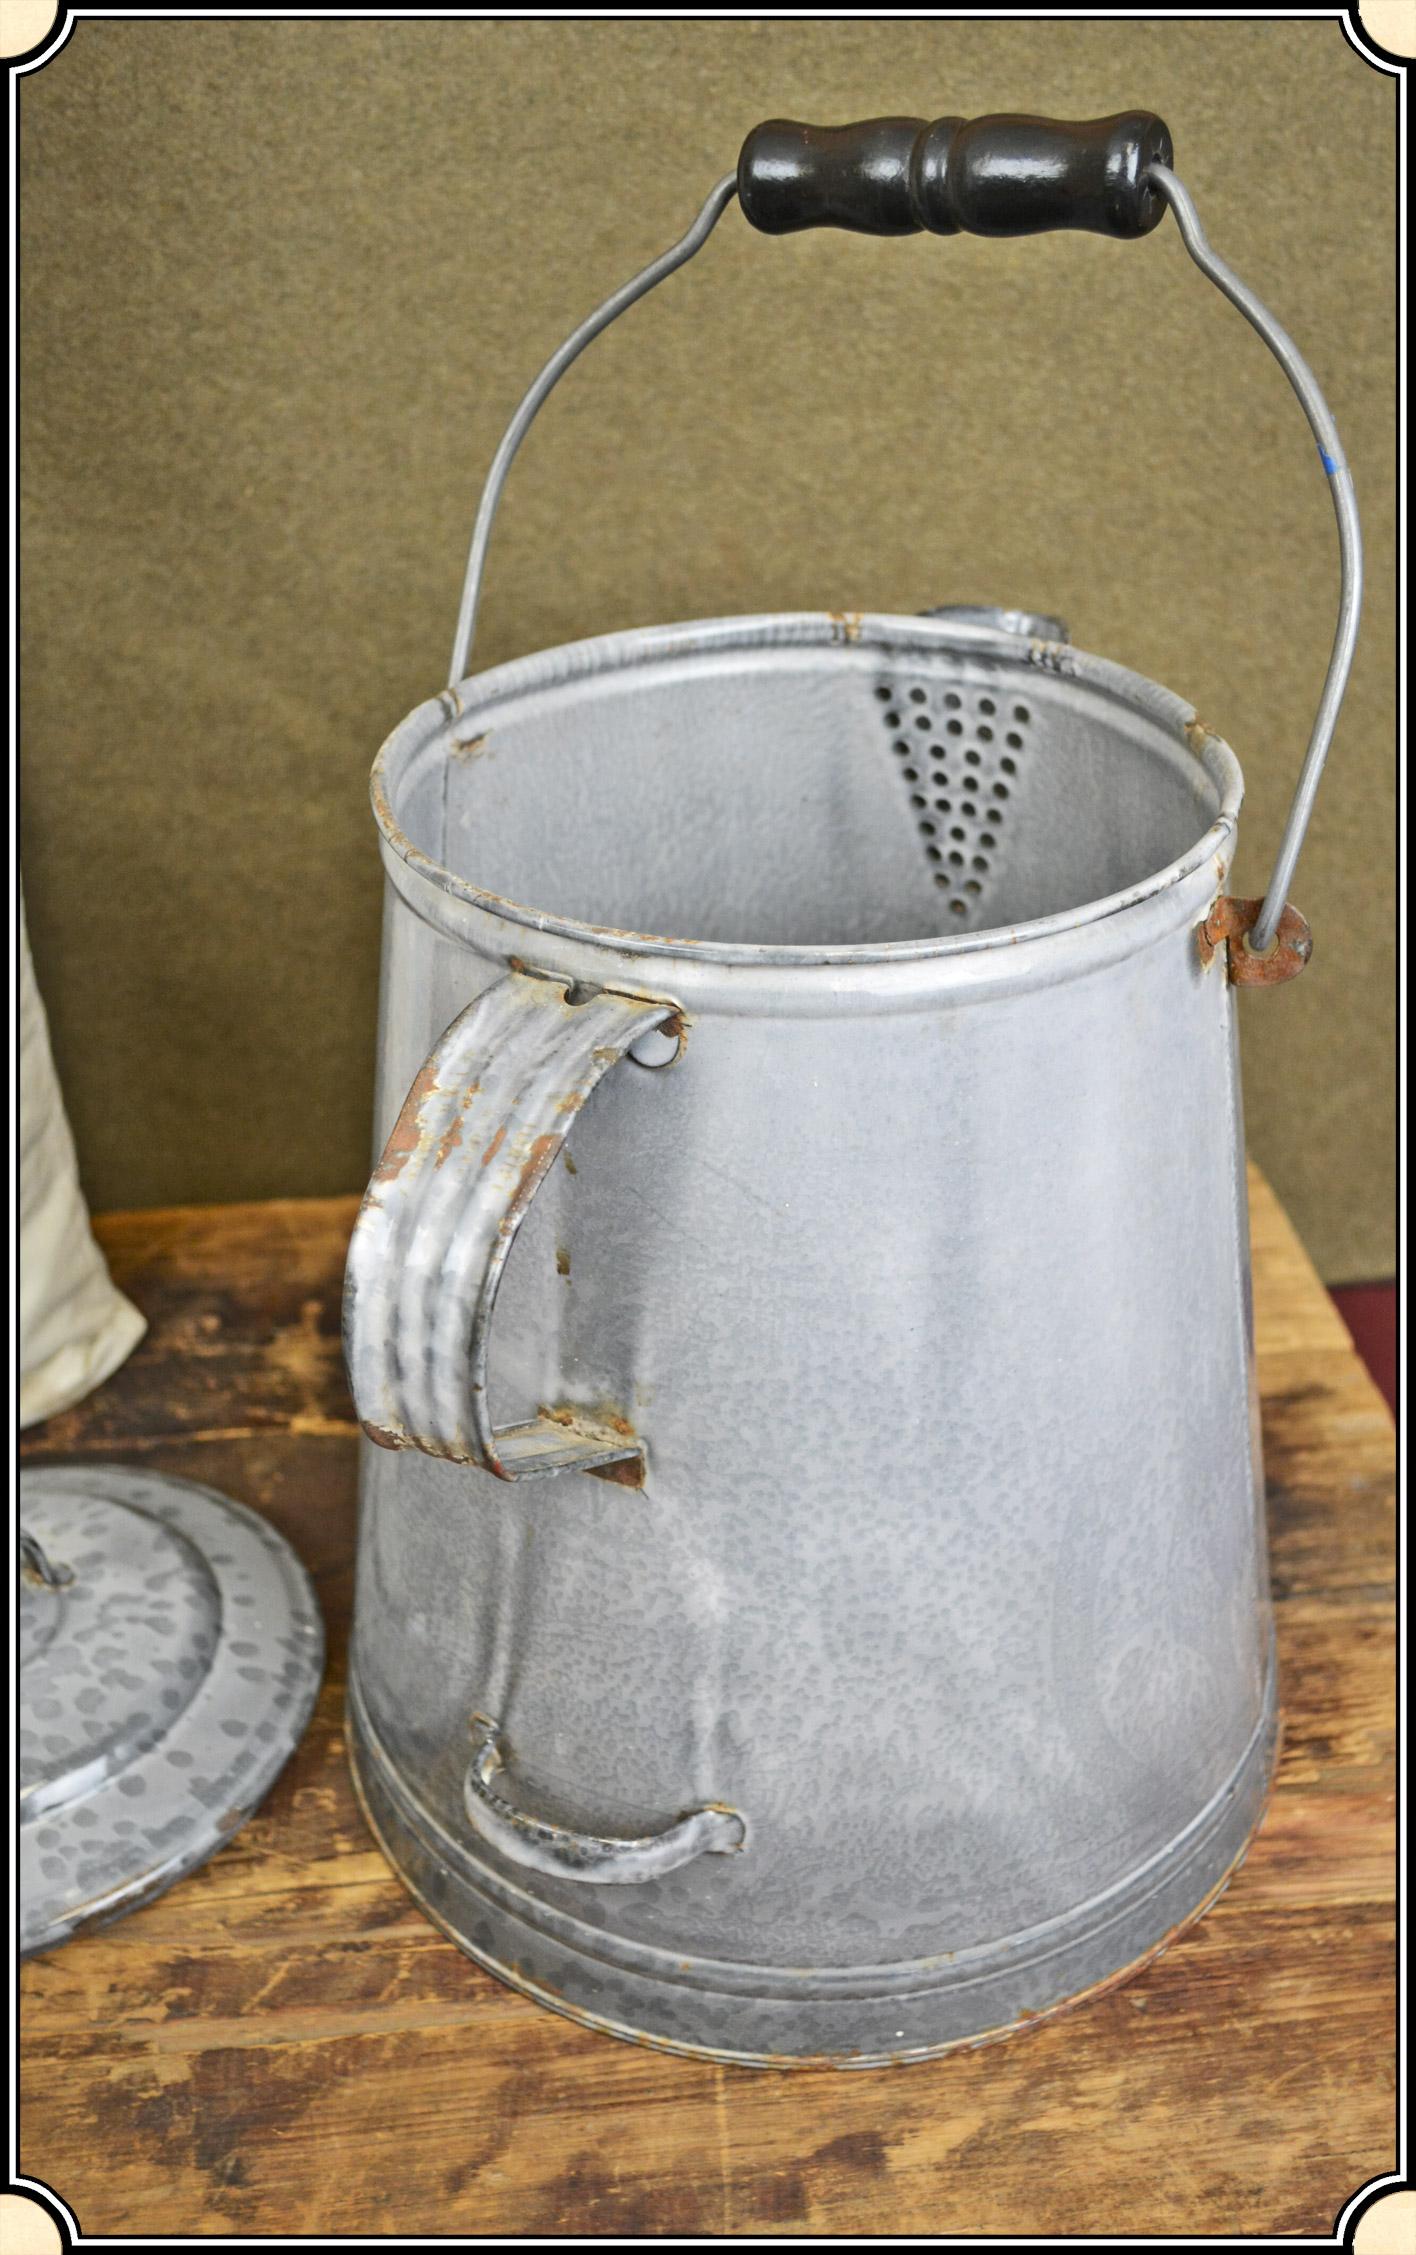 Chuck Wagon Enameled Coffee Pot